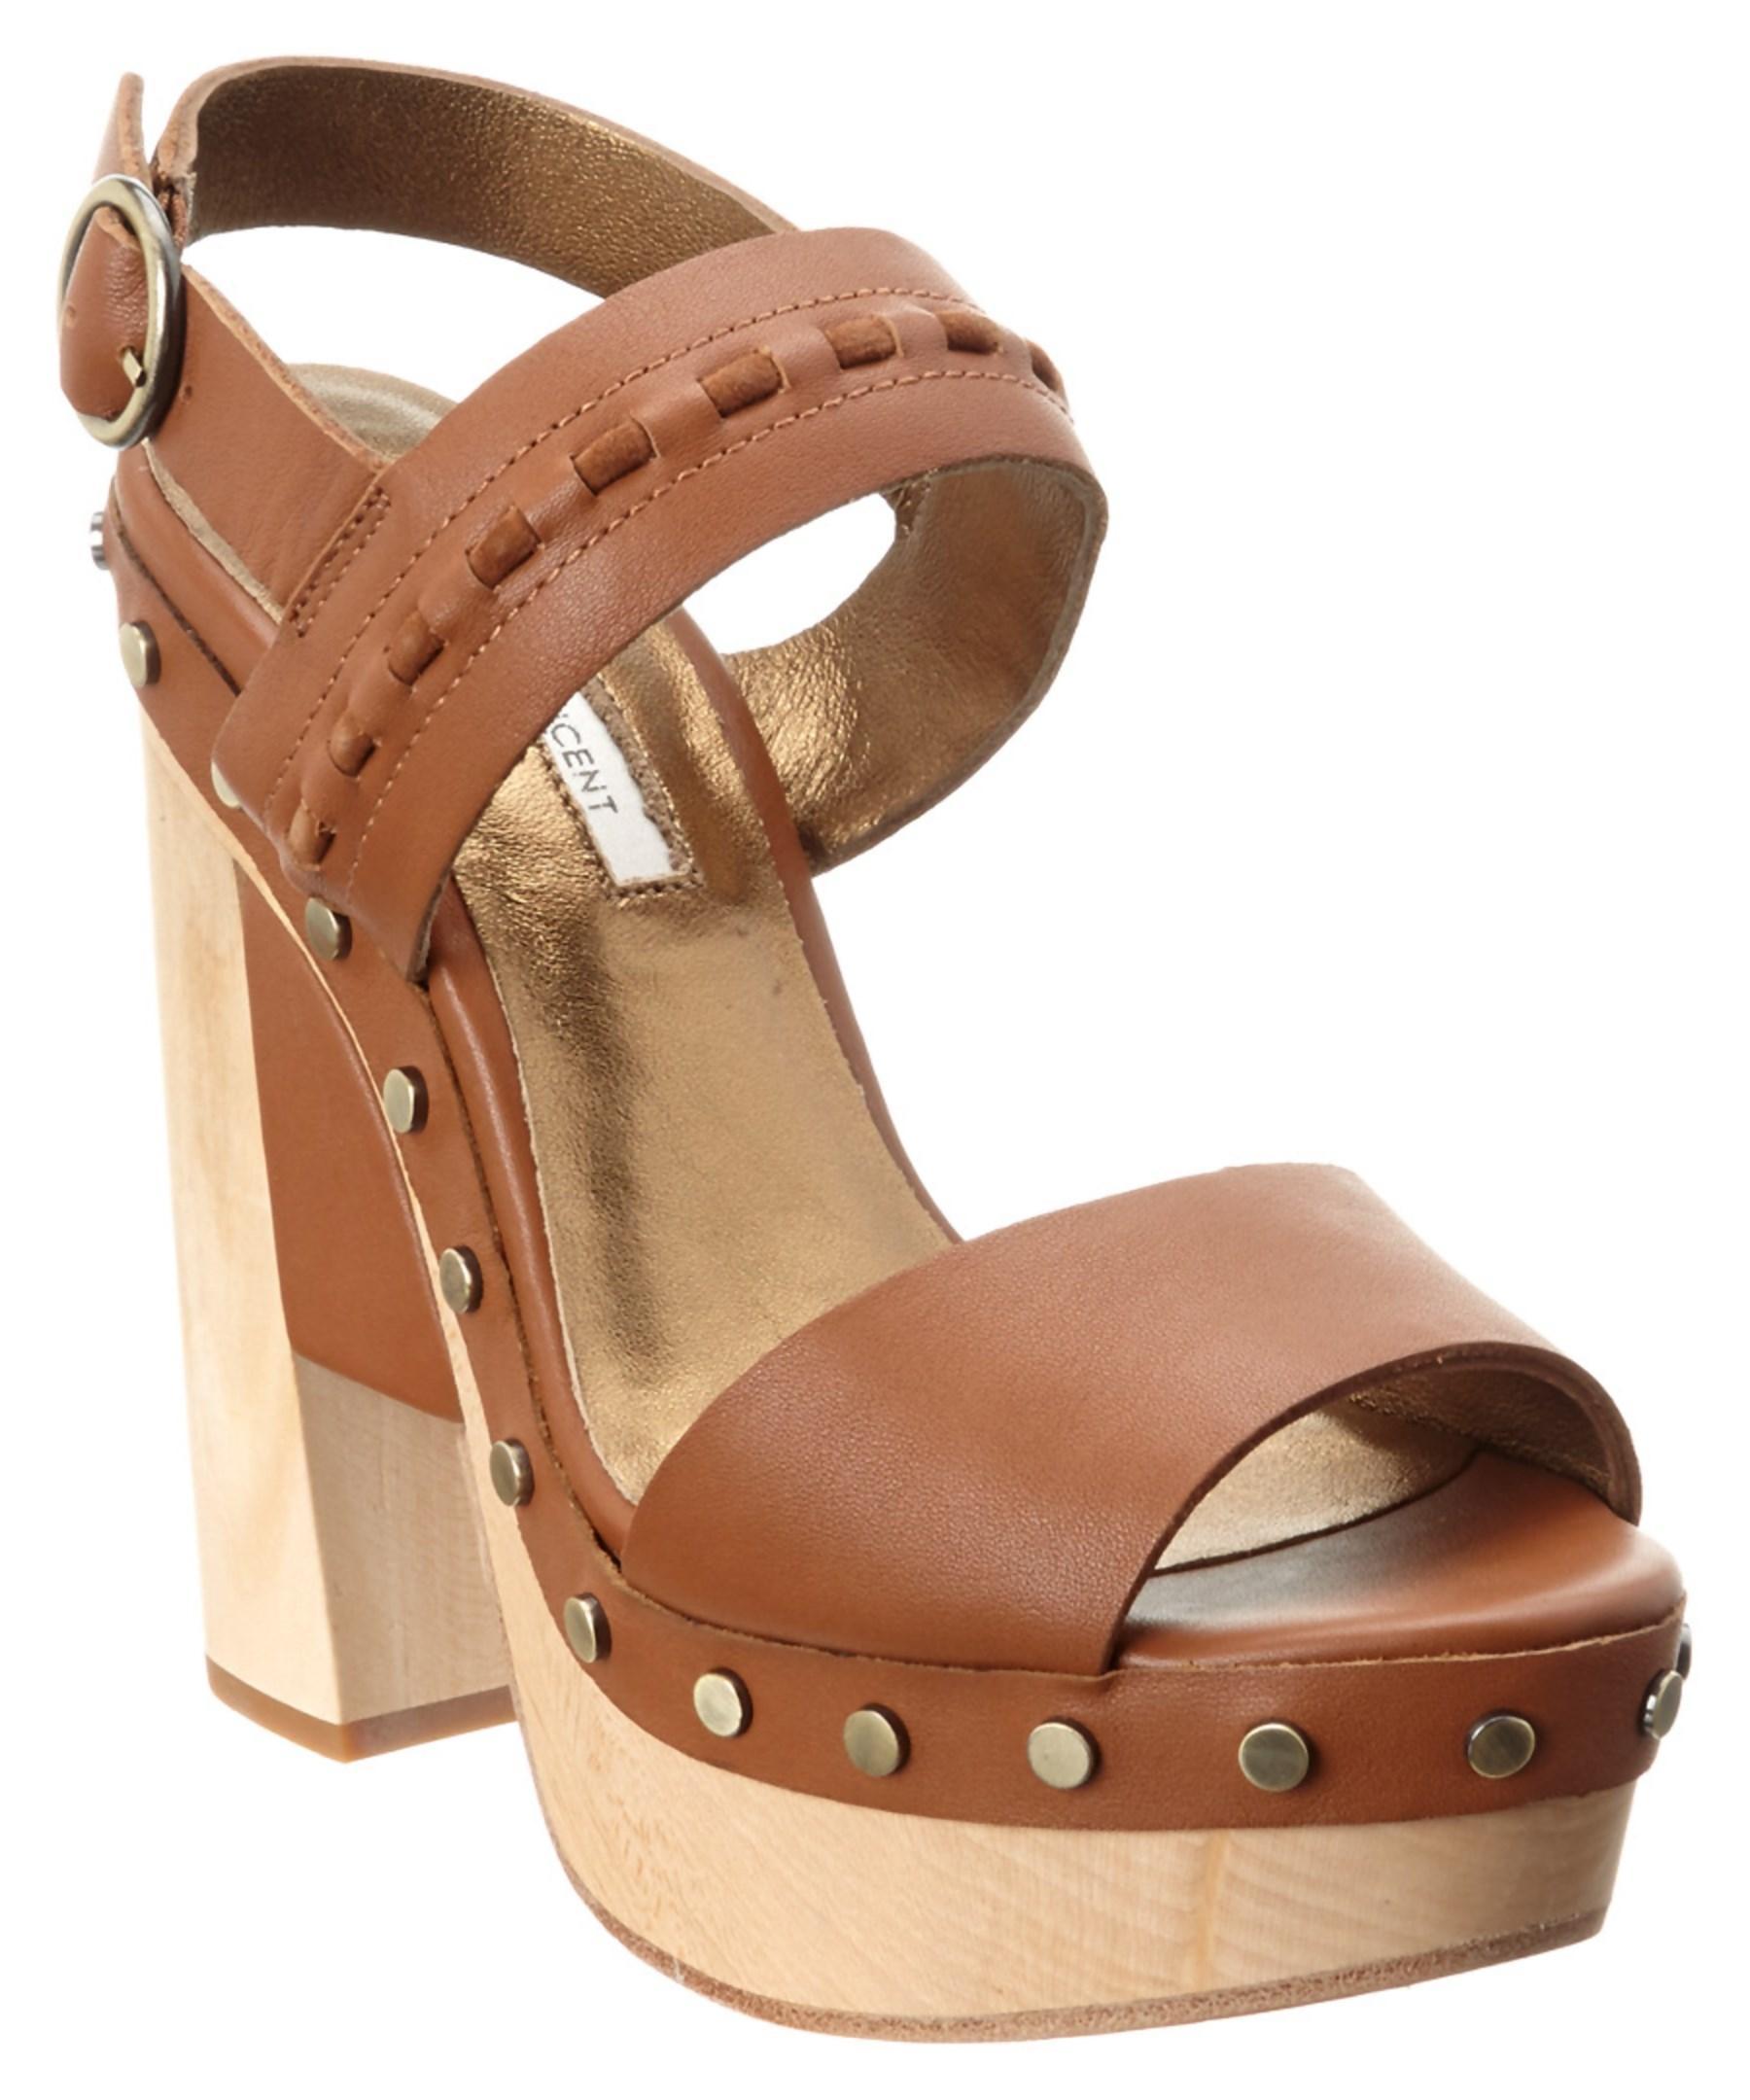 Cynthia Vincent Multicolor Potent Leather Sandal Lyst